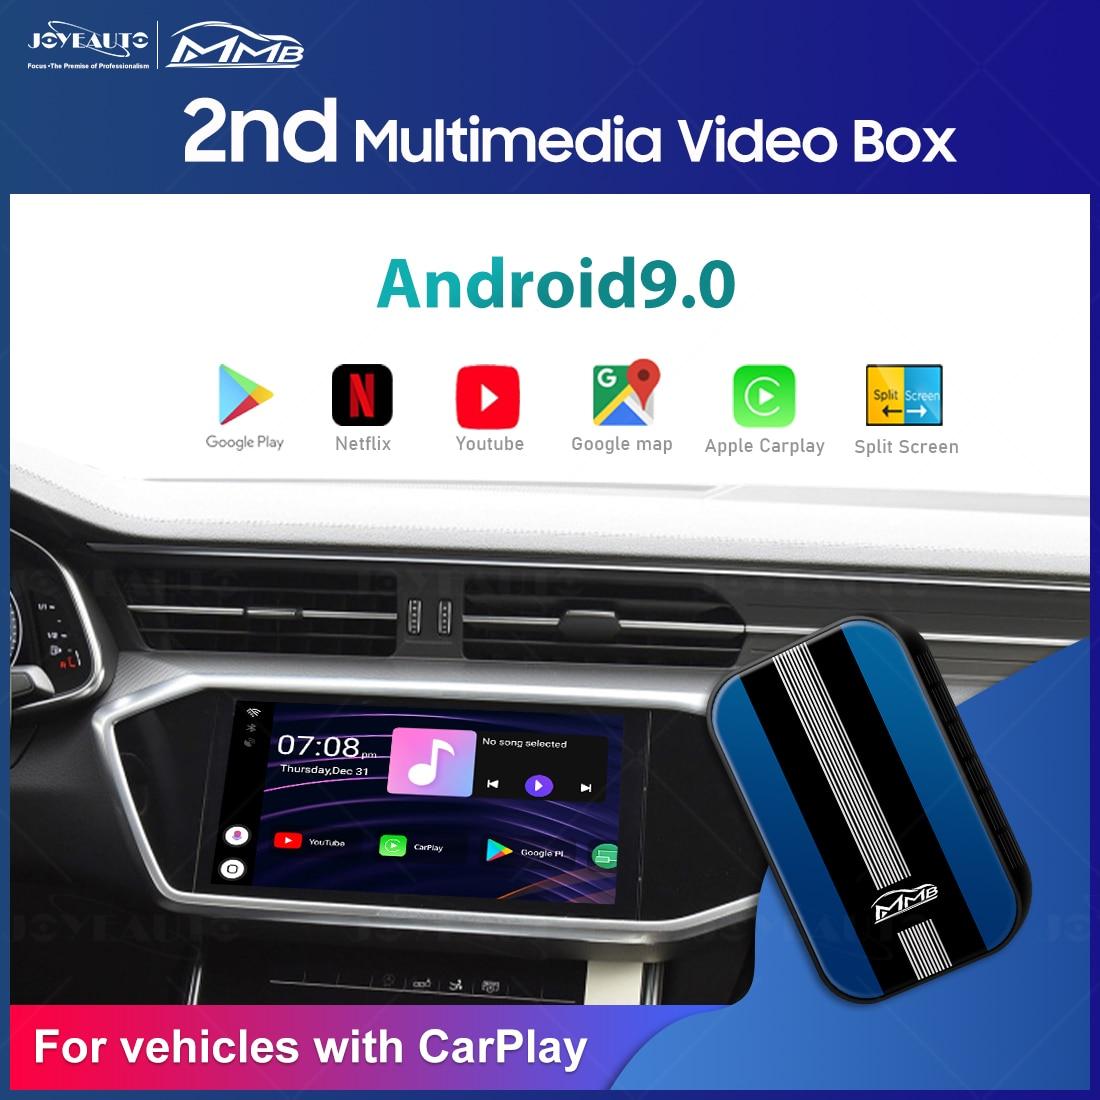 MMB أندرويد Carplay صندوق لاسلكي أبل Carplay دونغل أندرويد 9 4 + 32GB أندرويد النسخ المتطابق يوتيوب Netflix لاعب صندوق الملاحة